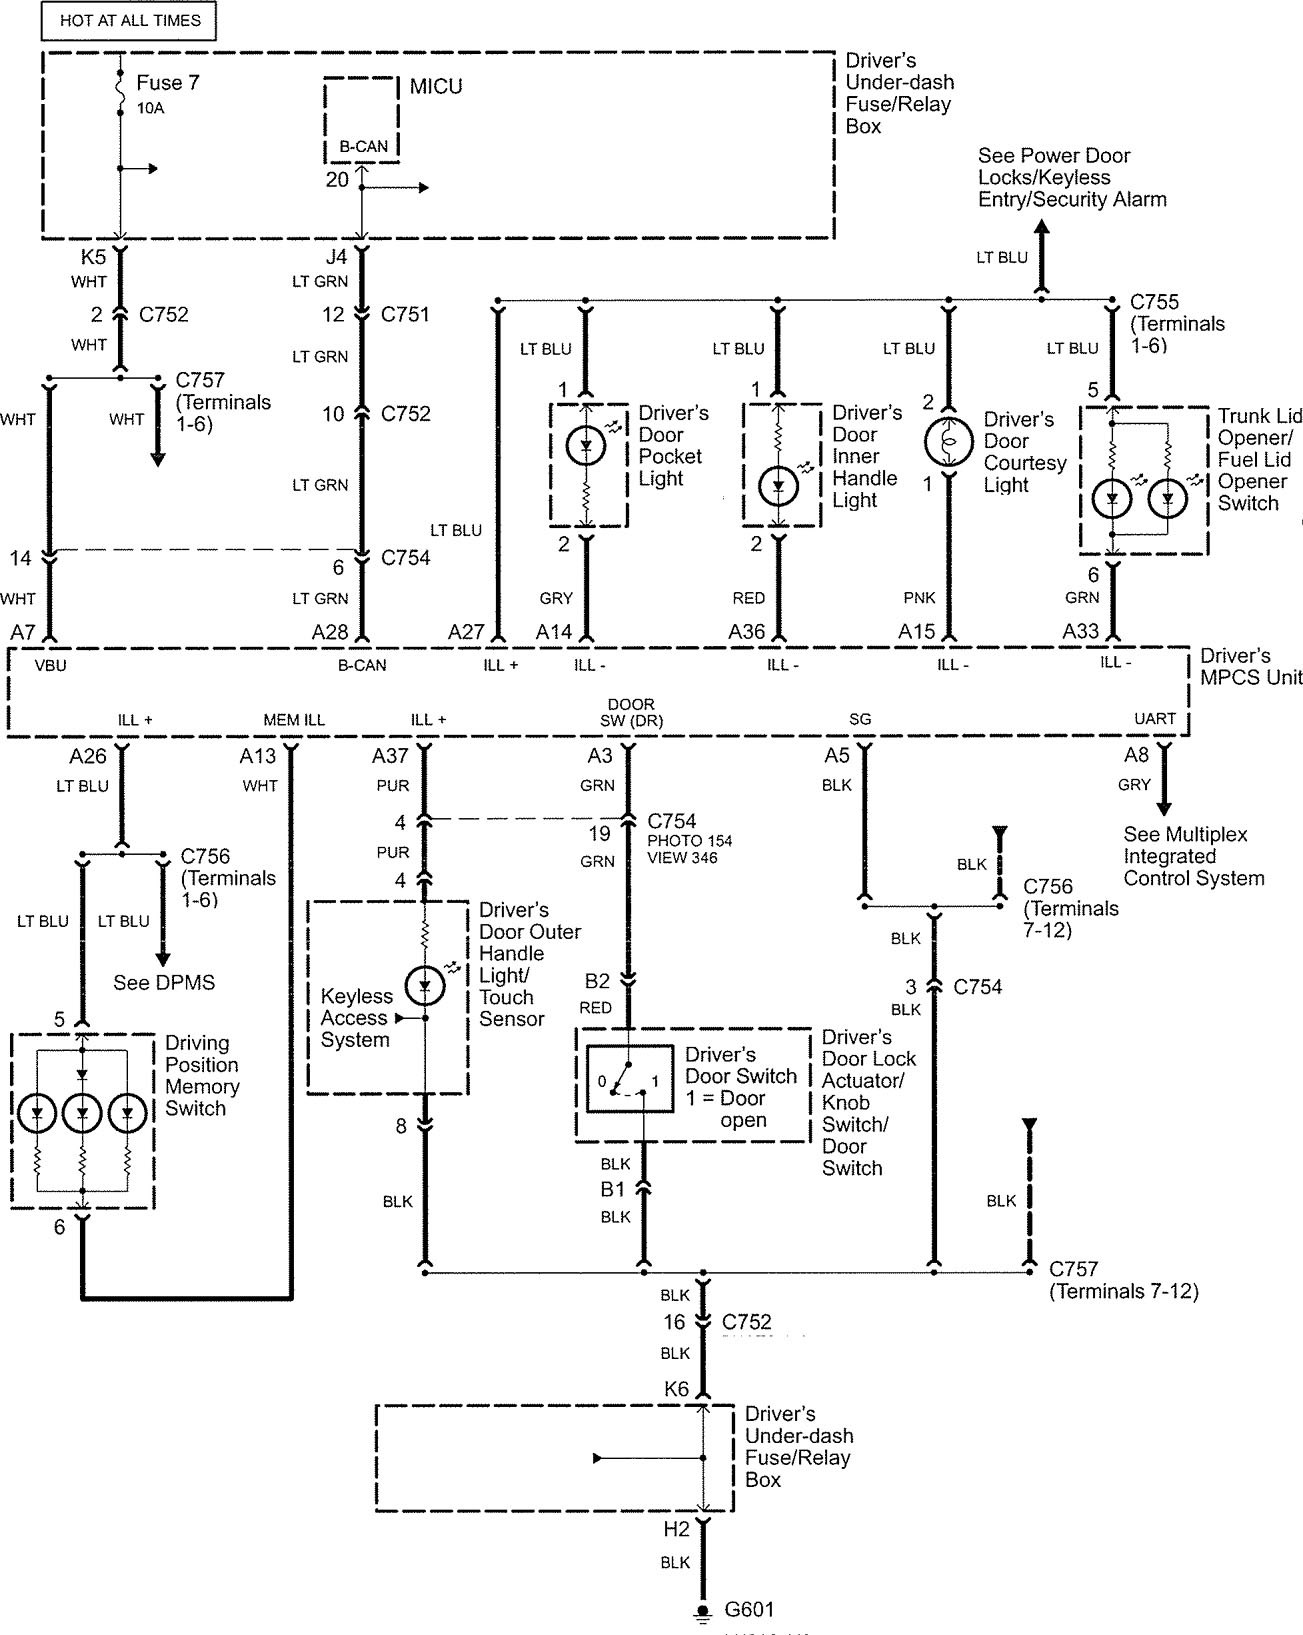 2005 saab interior lighting wiring - alpine cde 123 wiring harness -  furnaces.sampwire.jeanjaures37.fr  wiring diagram resource